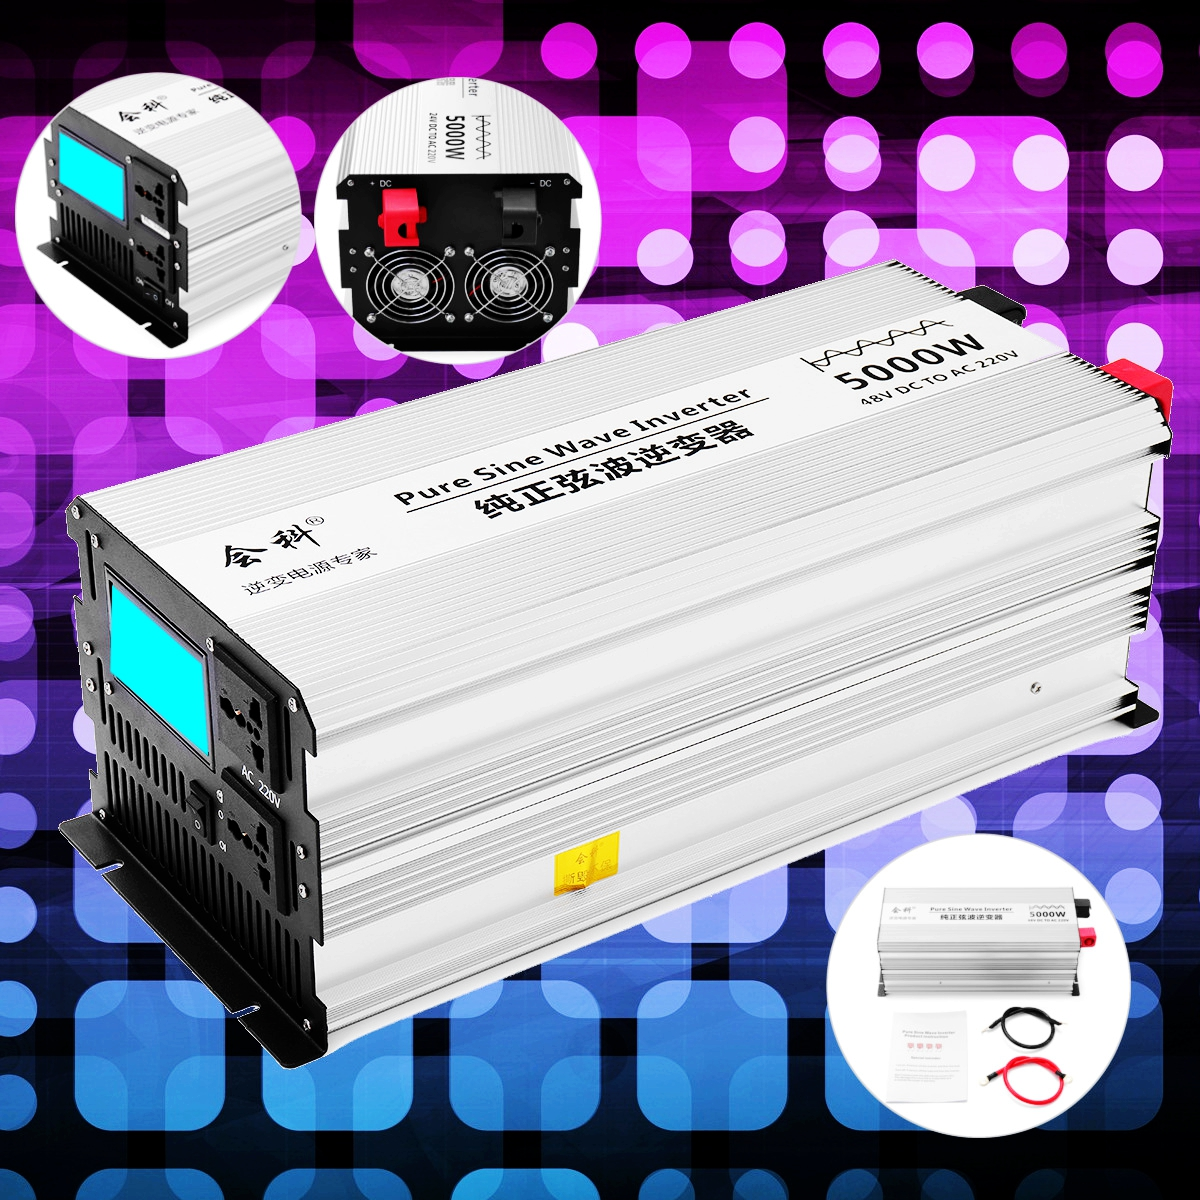 Inverter onda sinusoidale pura 2500 w 5000 w P eak 50 hz DC 12 v/24 v/48 v per AC 110 v/220 v di Tensione Trasformatore Converte display LCD Inverter